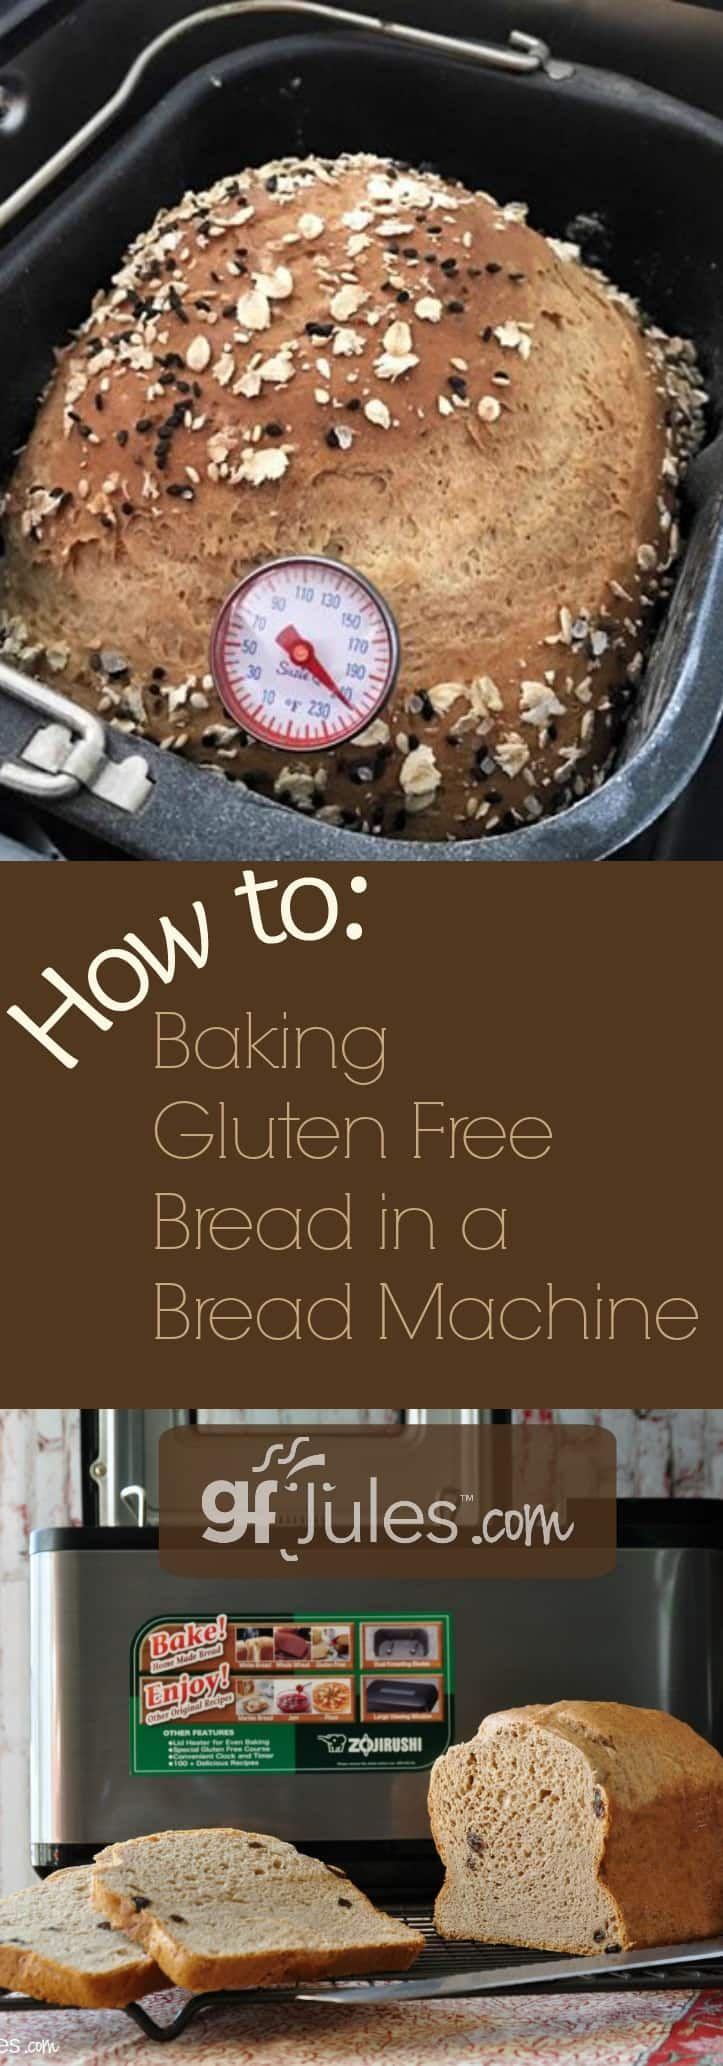 How to Bake Gluten Free Bread in a Bread Maker | gfJules.com